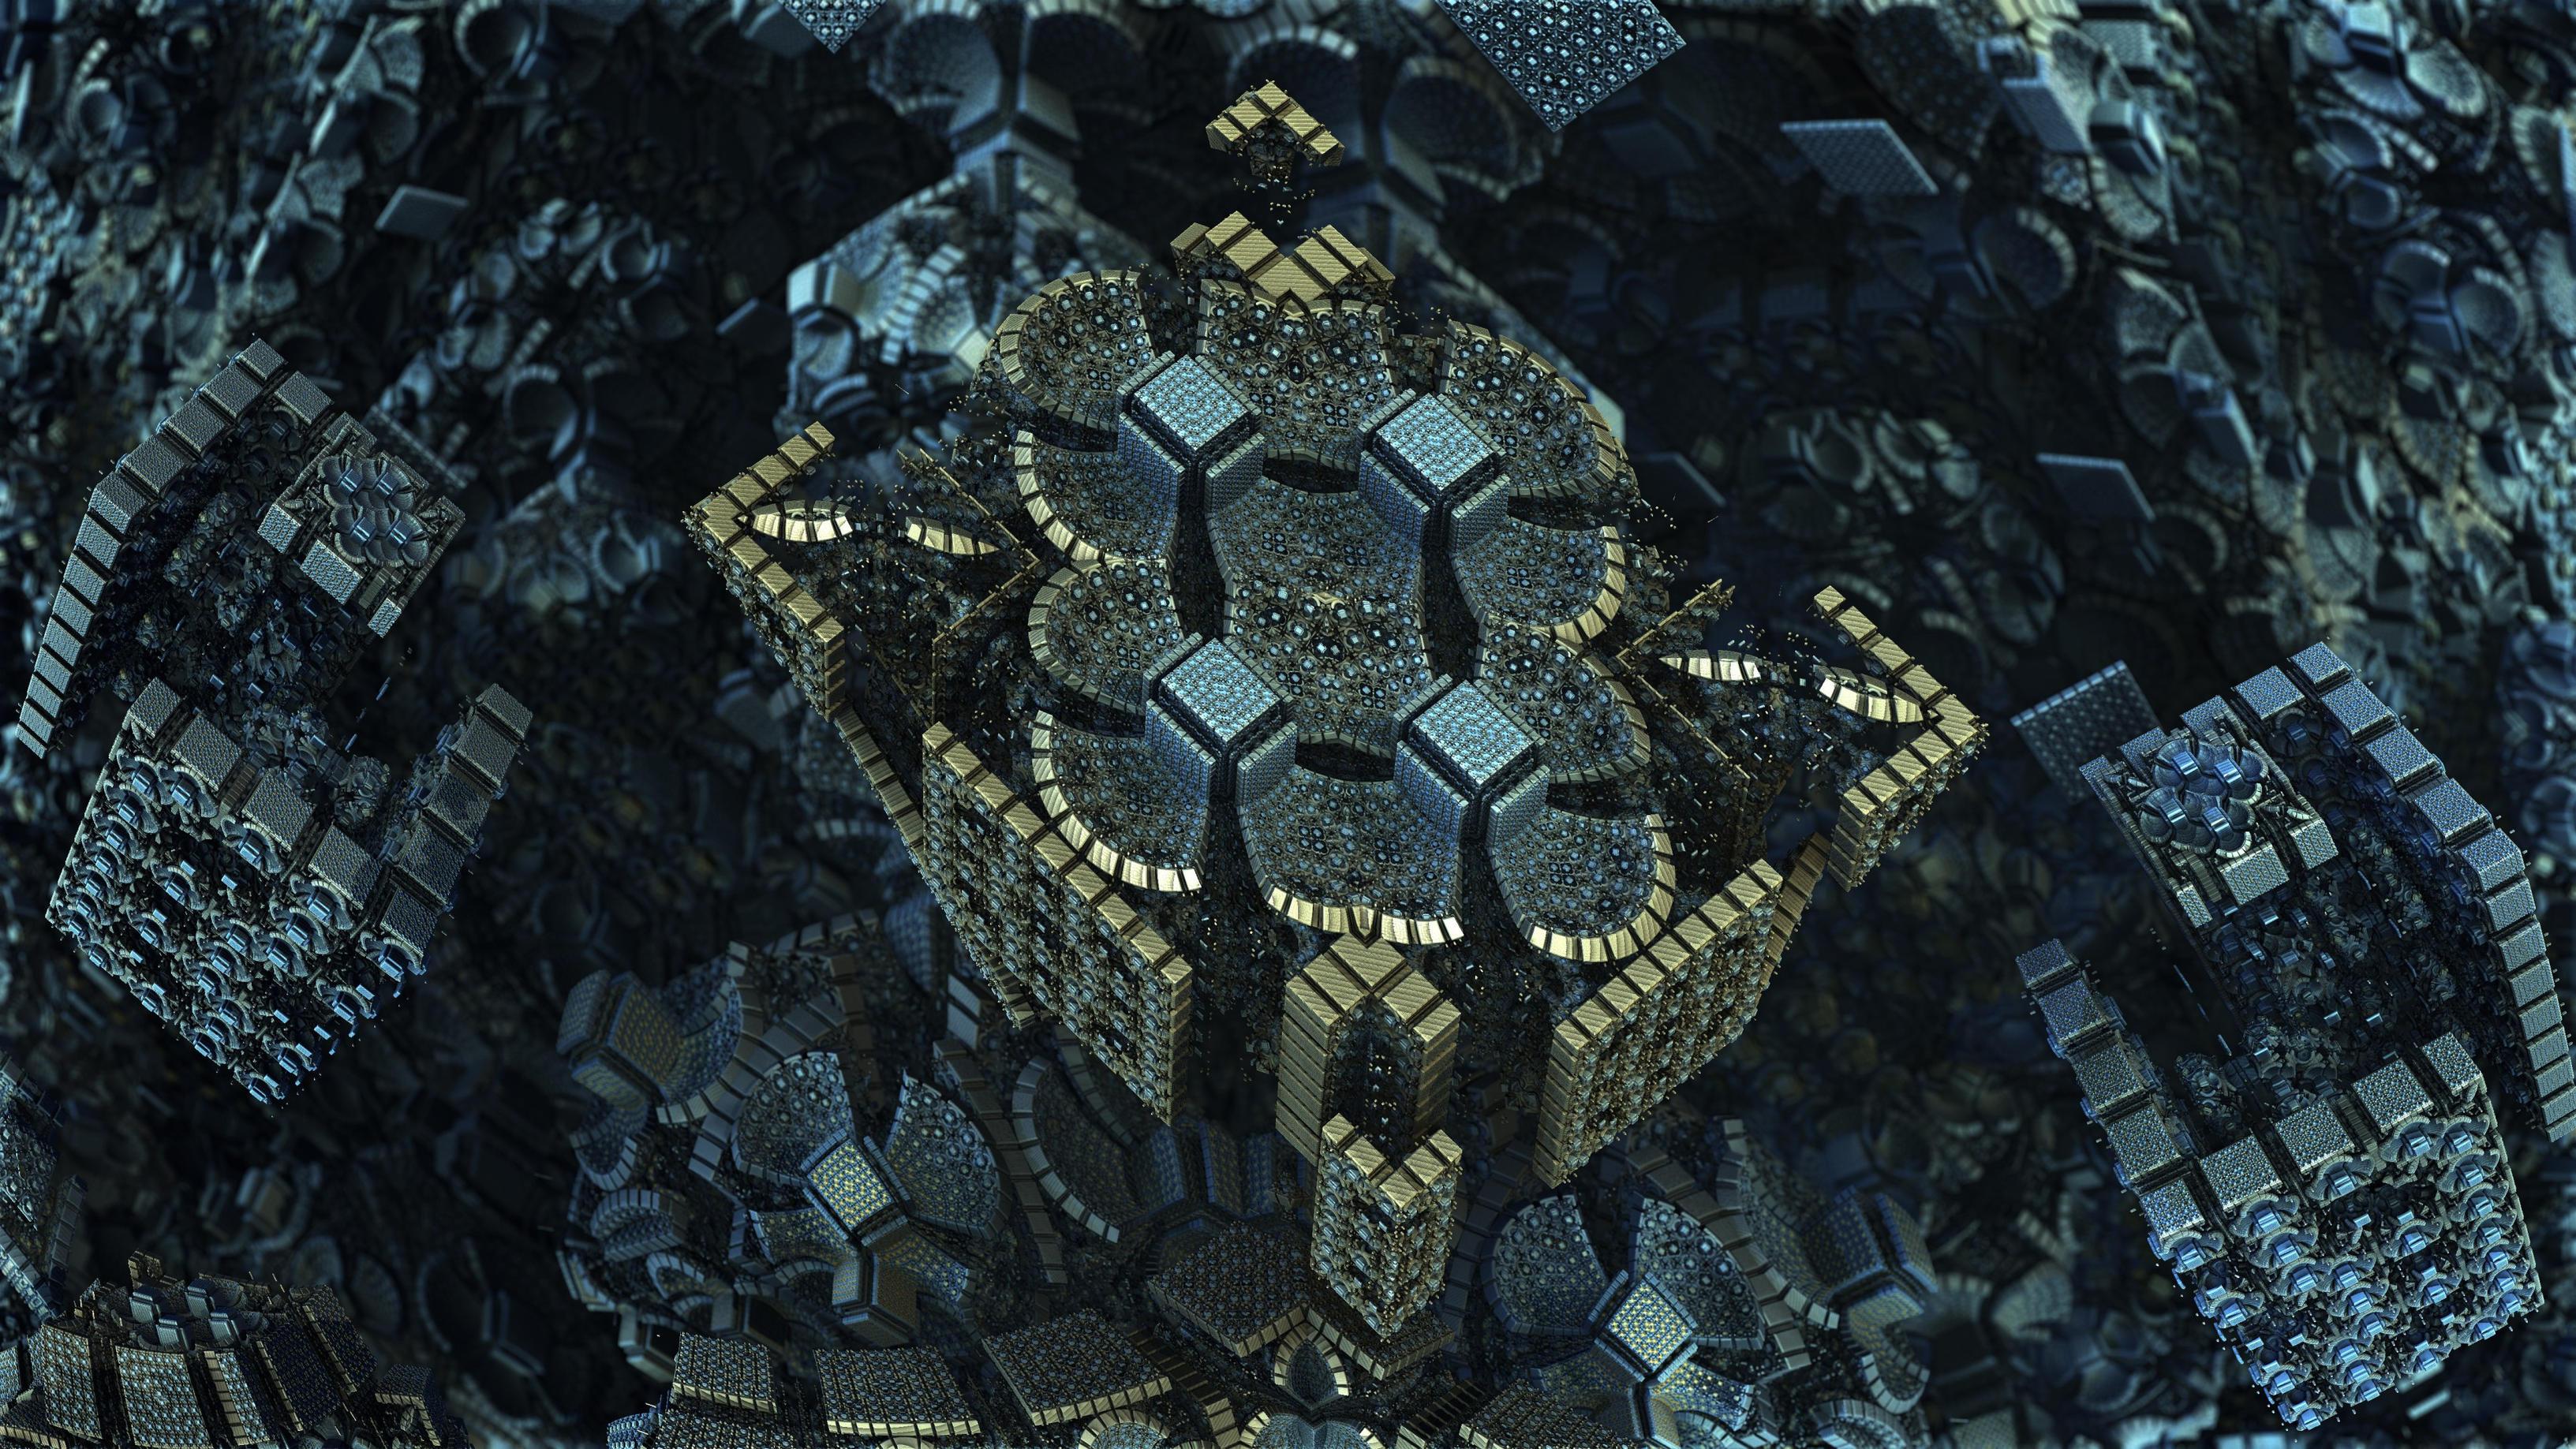 Fractal Short Kicks 3 Startframe - Mandelbulb 3D by schizo604